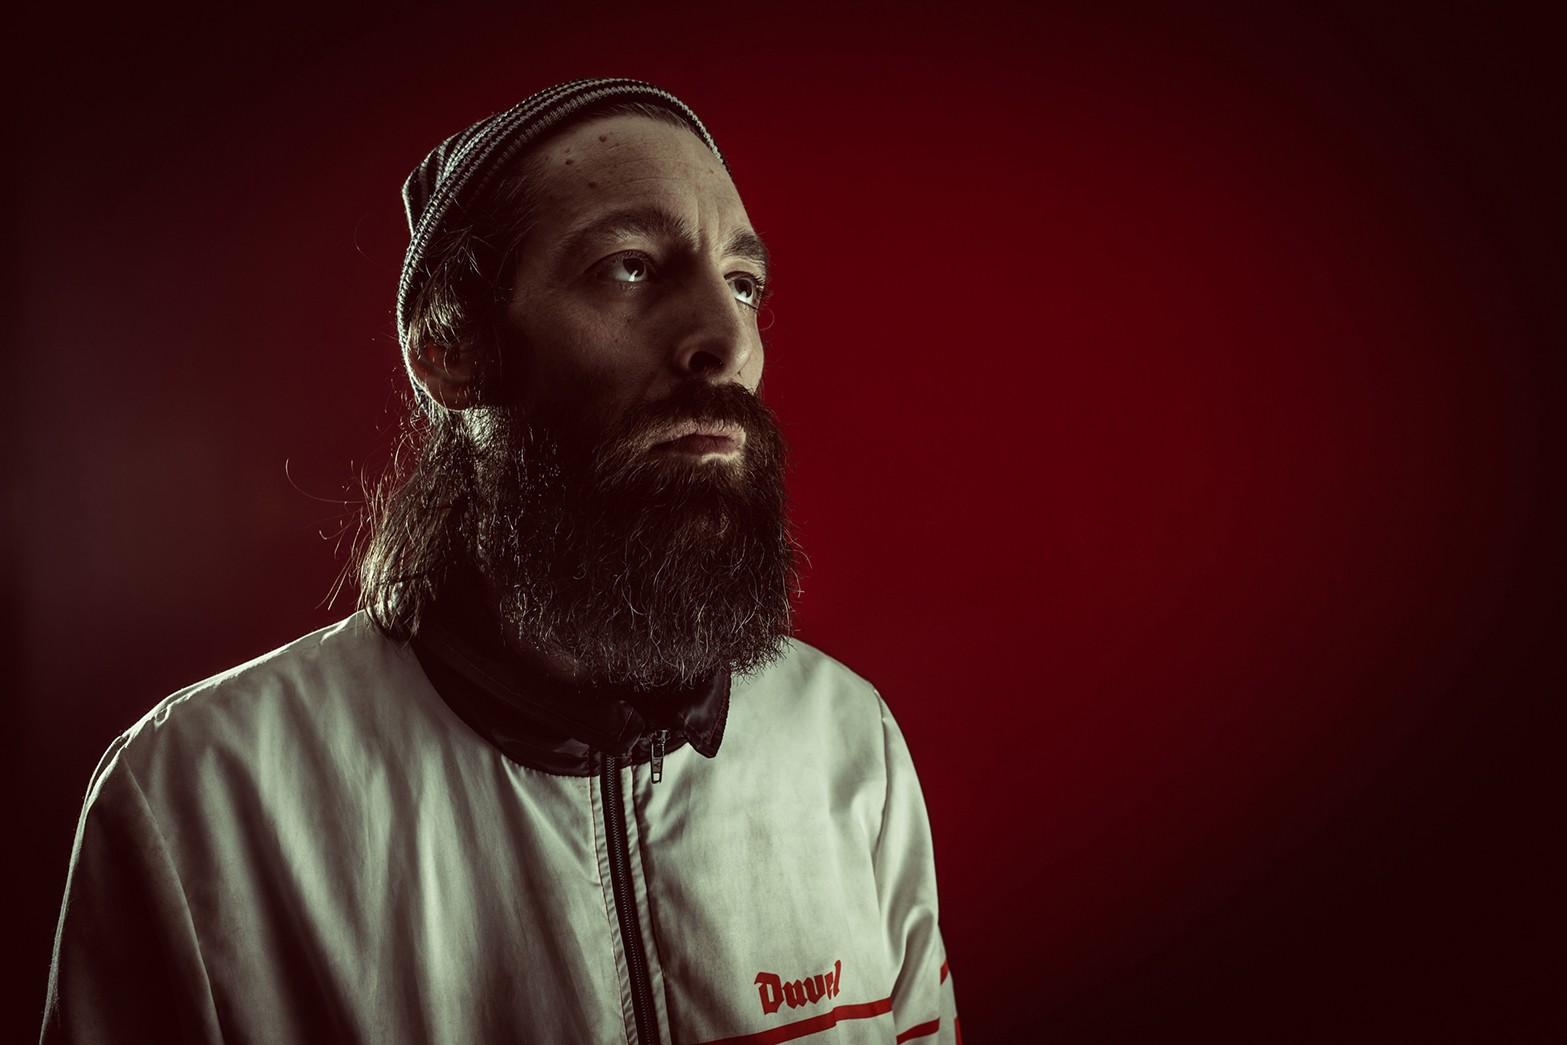 Djavanshir.n - rock portrait - LARCHITECTEPUNK